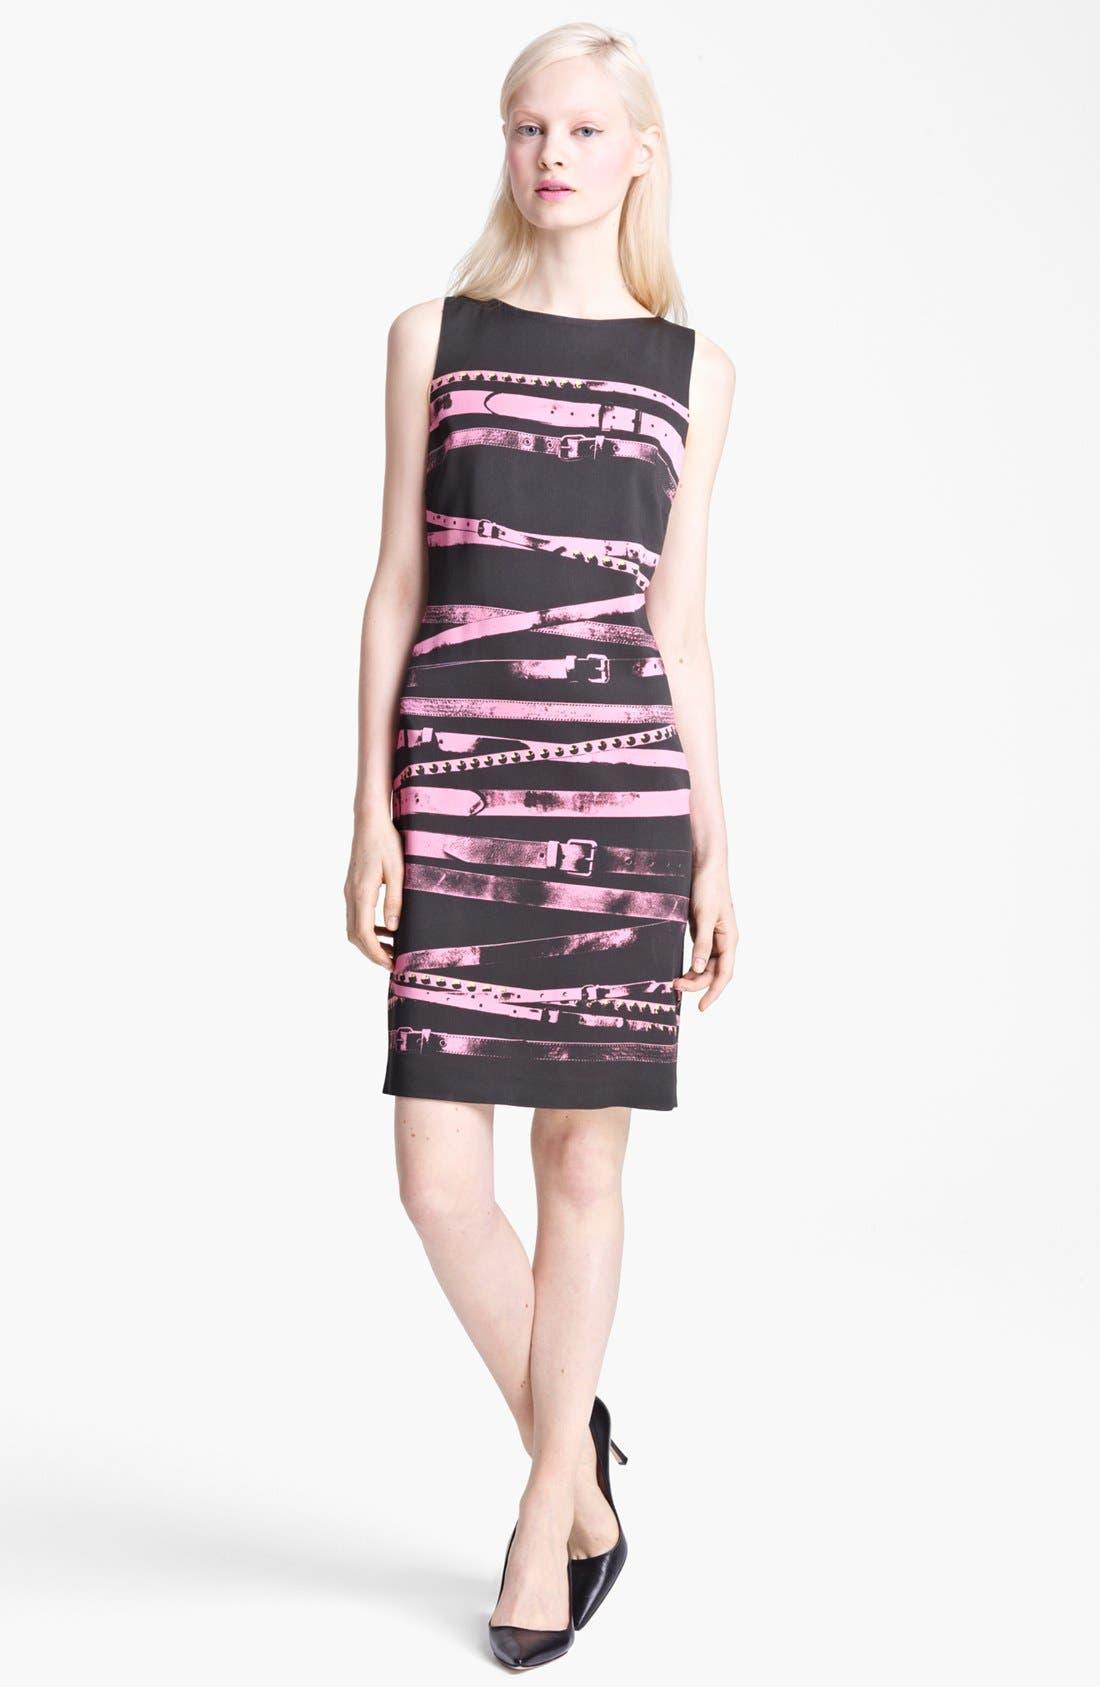 Main Image - Moschino Cheap & Chic Sleeveless Belt Print Dress